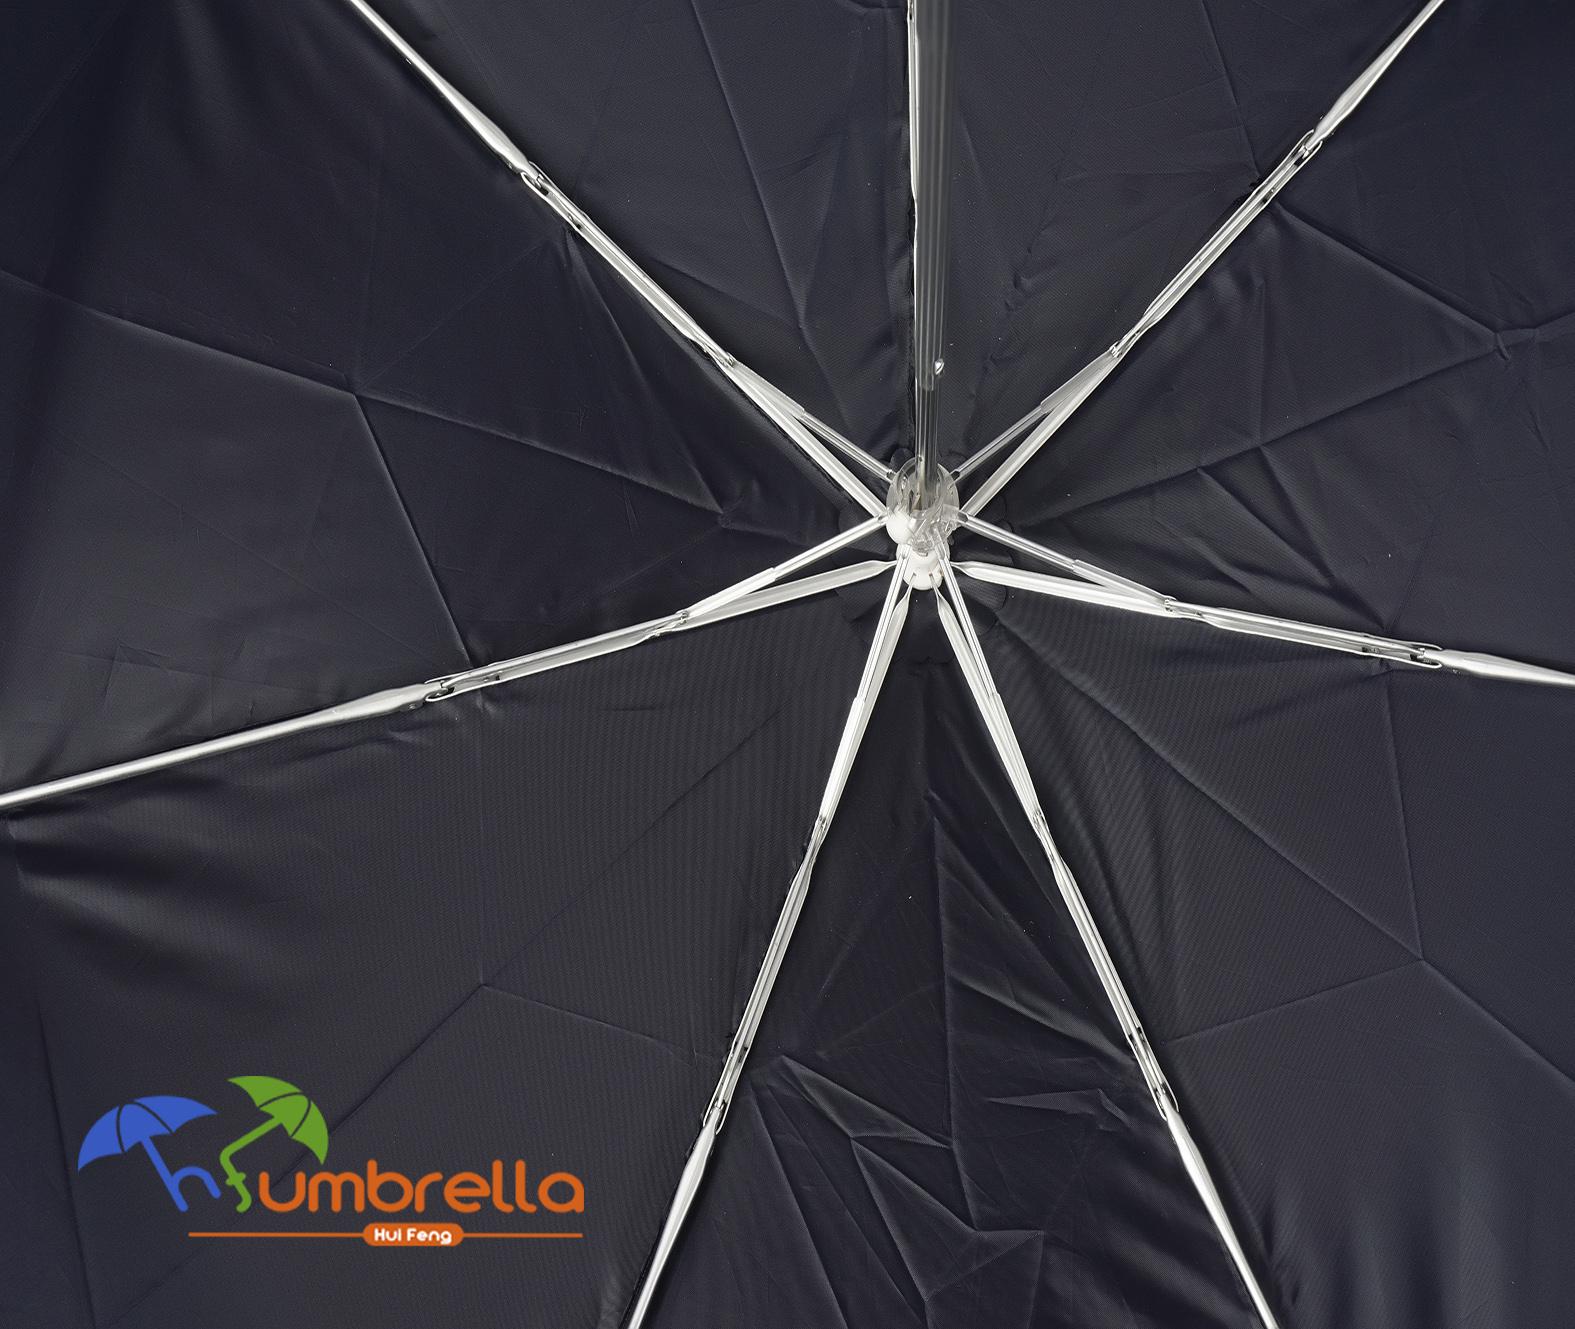 Handiness Tourism Umbrella